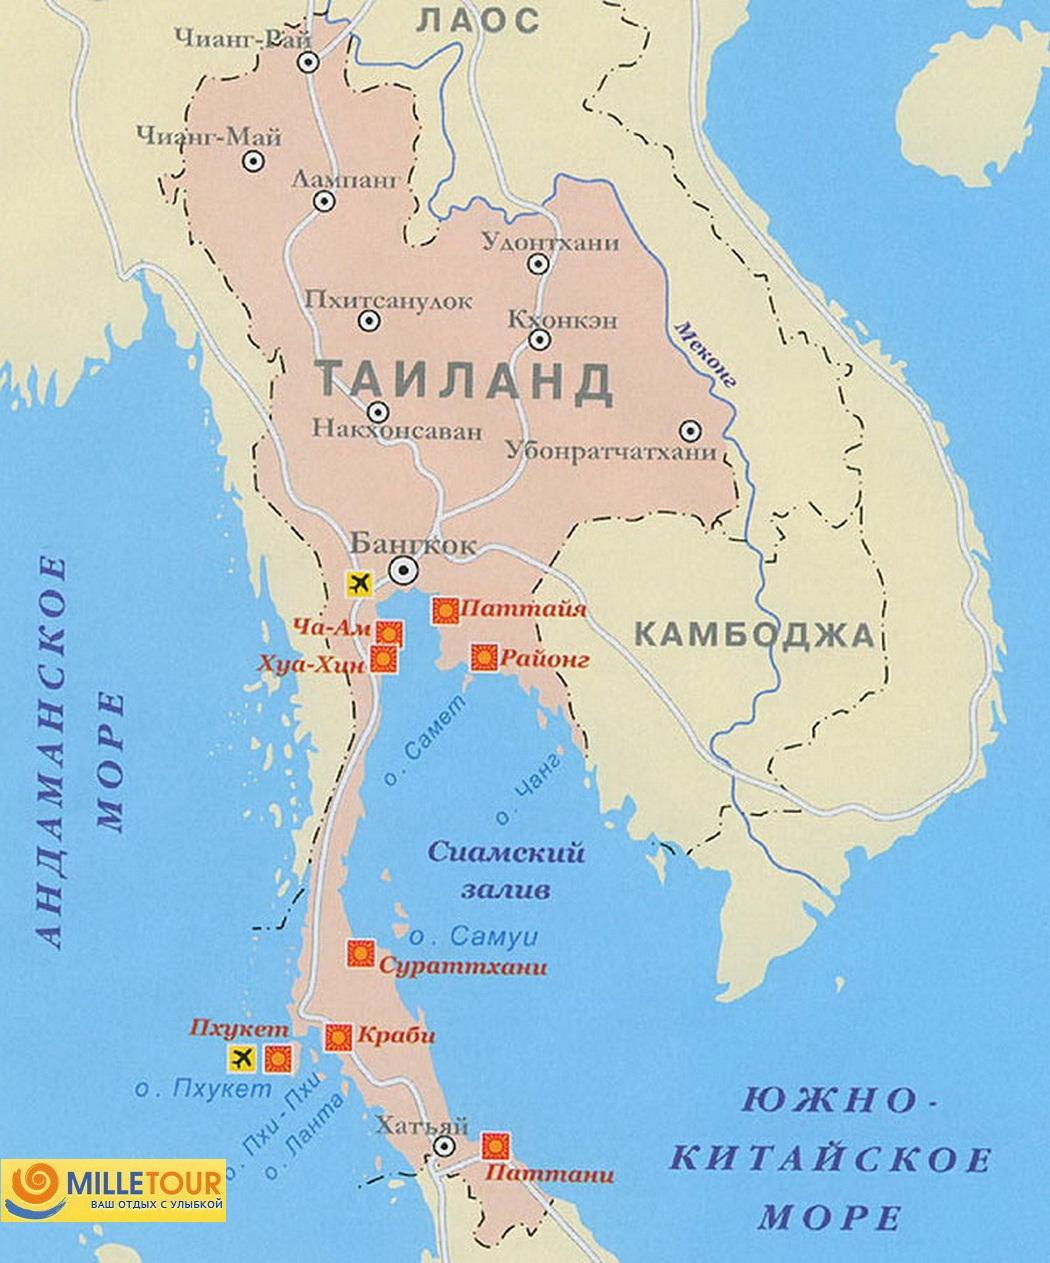 Где находится тайланд на карте мира